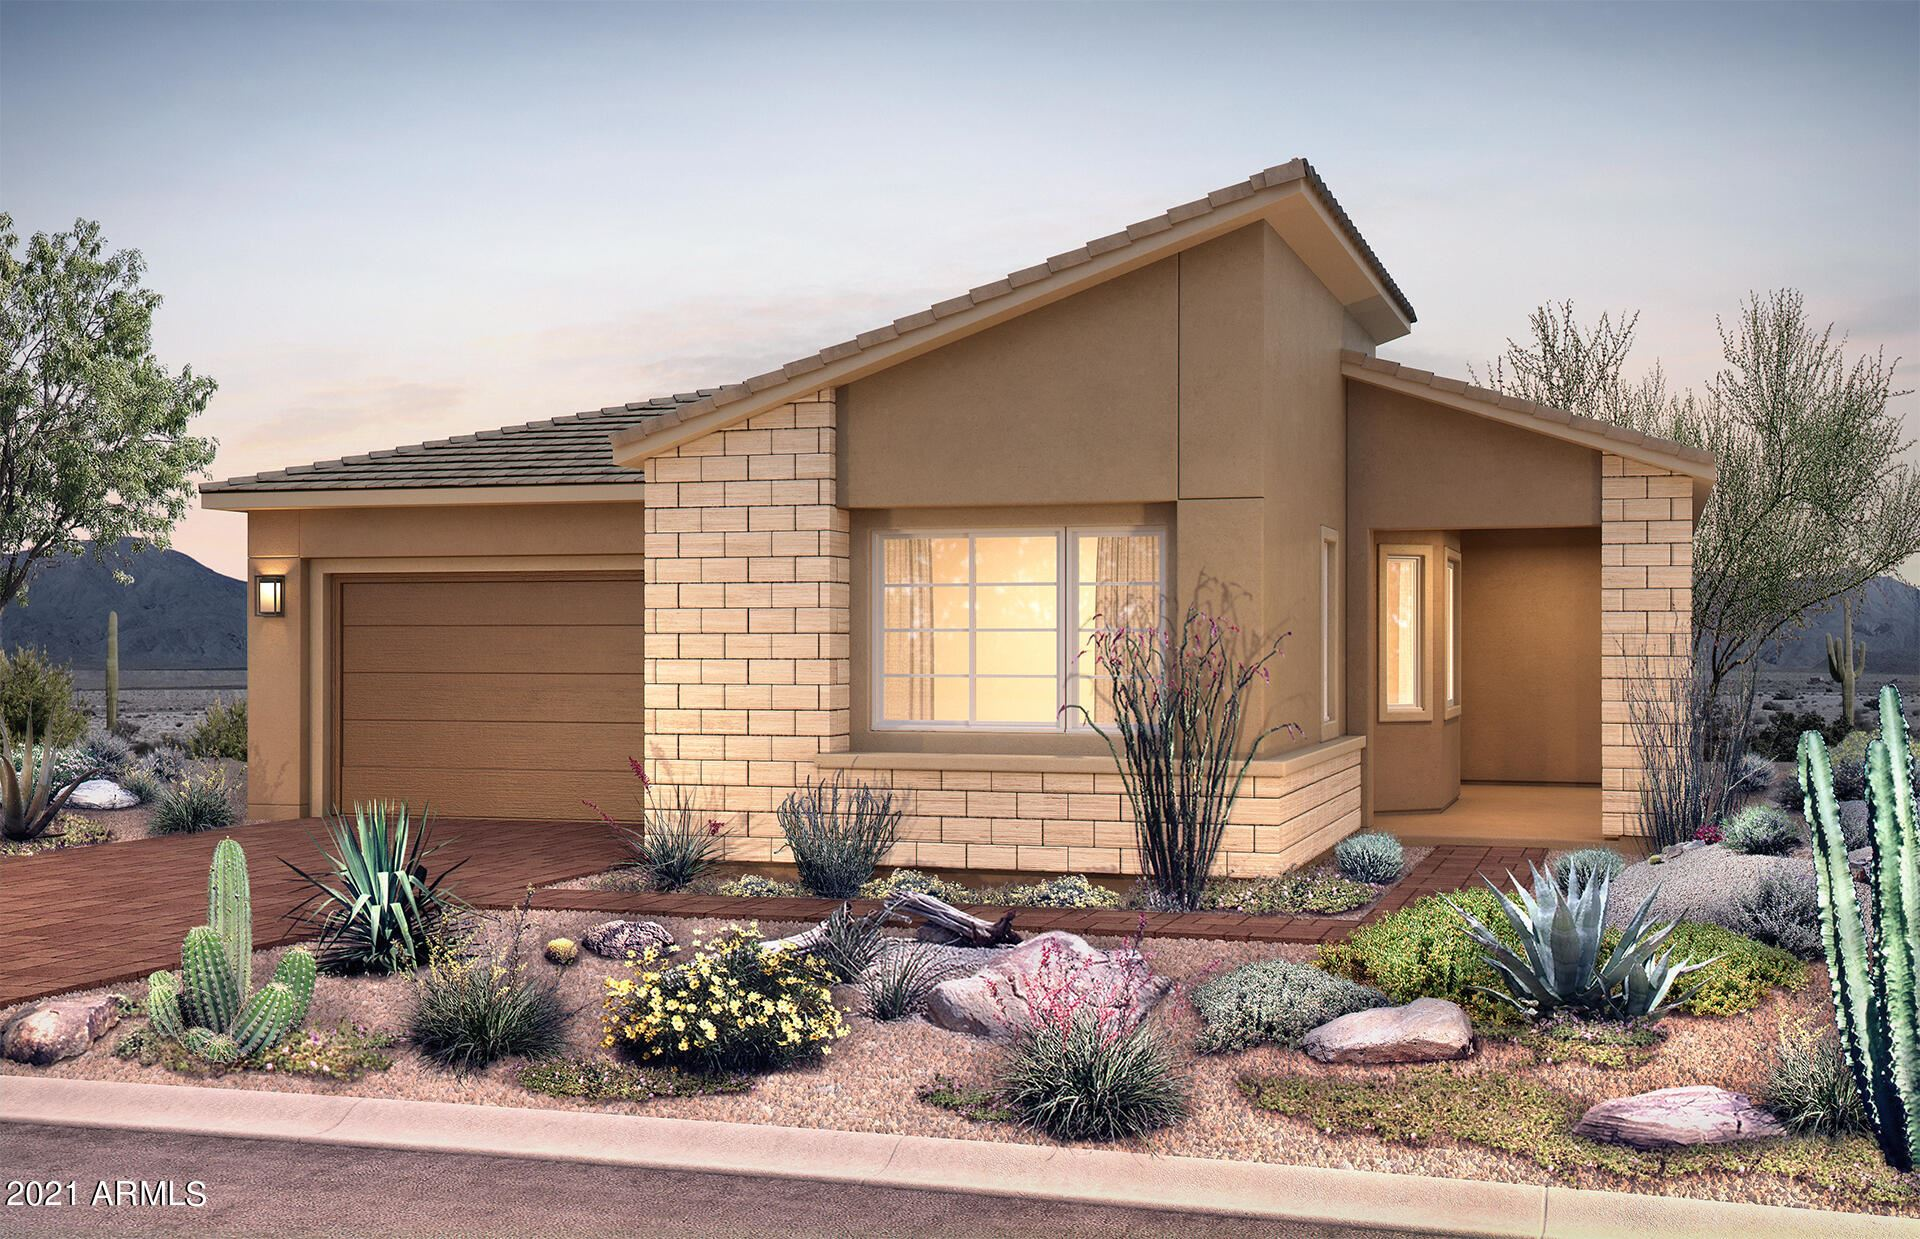 2847 E LOS GATOS Drive, Phoenix, AZ 85050 - MLS#: 6267665